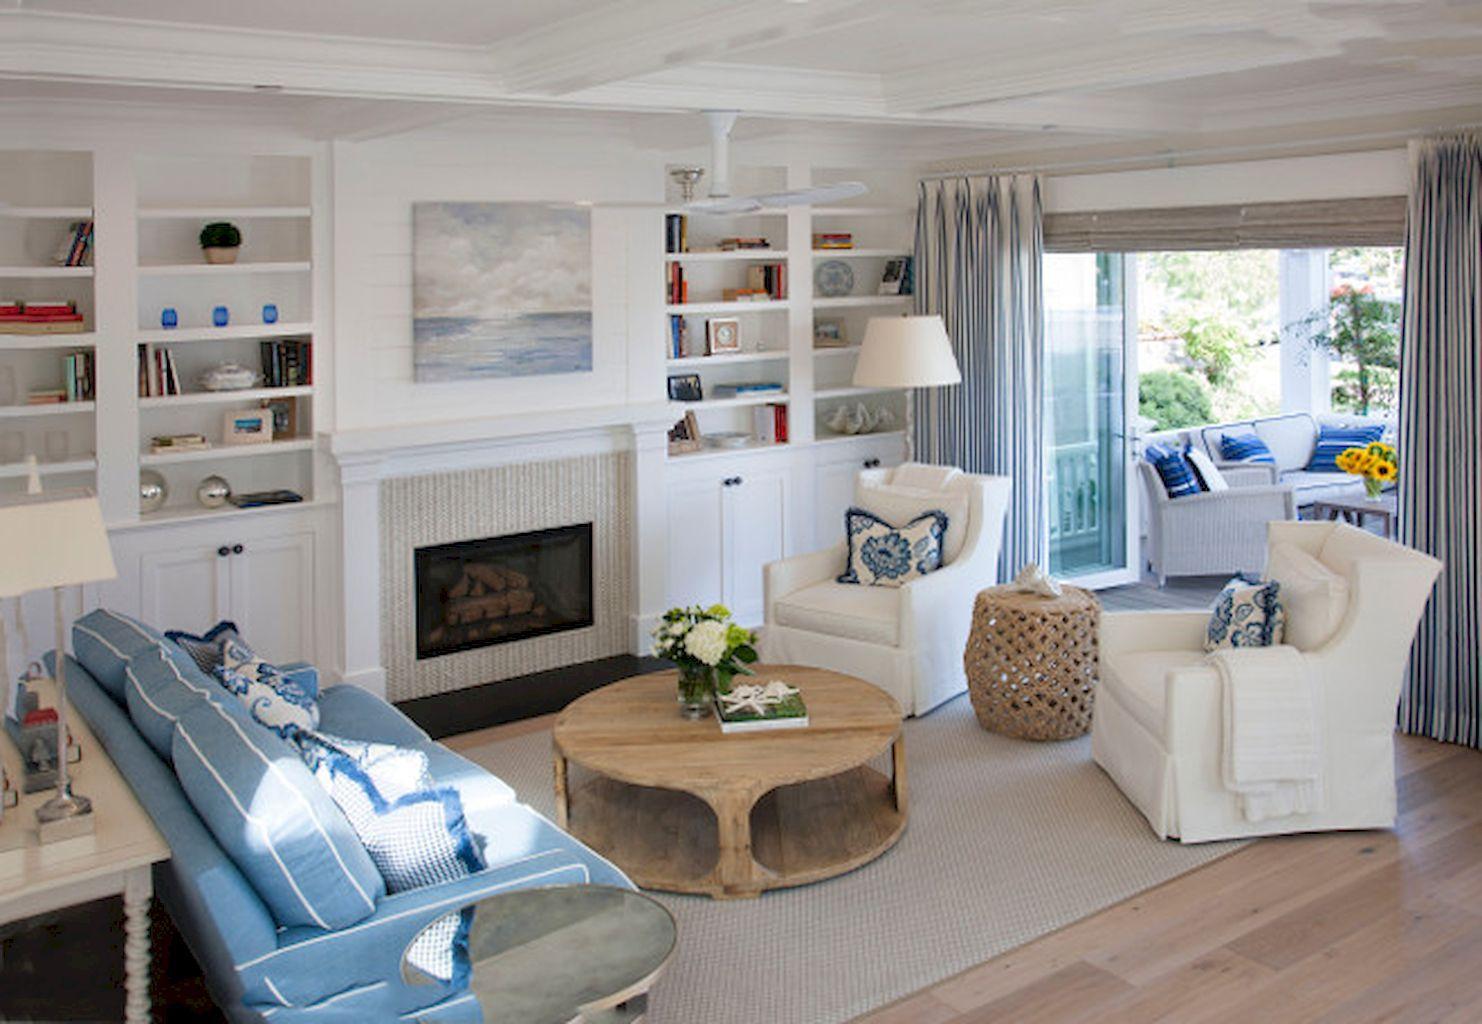 85 Cozy Coastal Living Room Decorating Ideas  Coastal Living Fair Coastal Living Room Designs Design Ideas